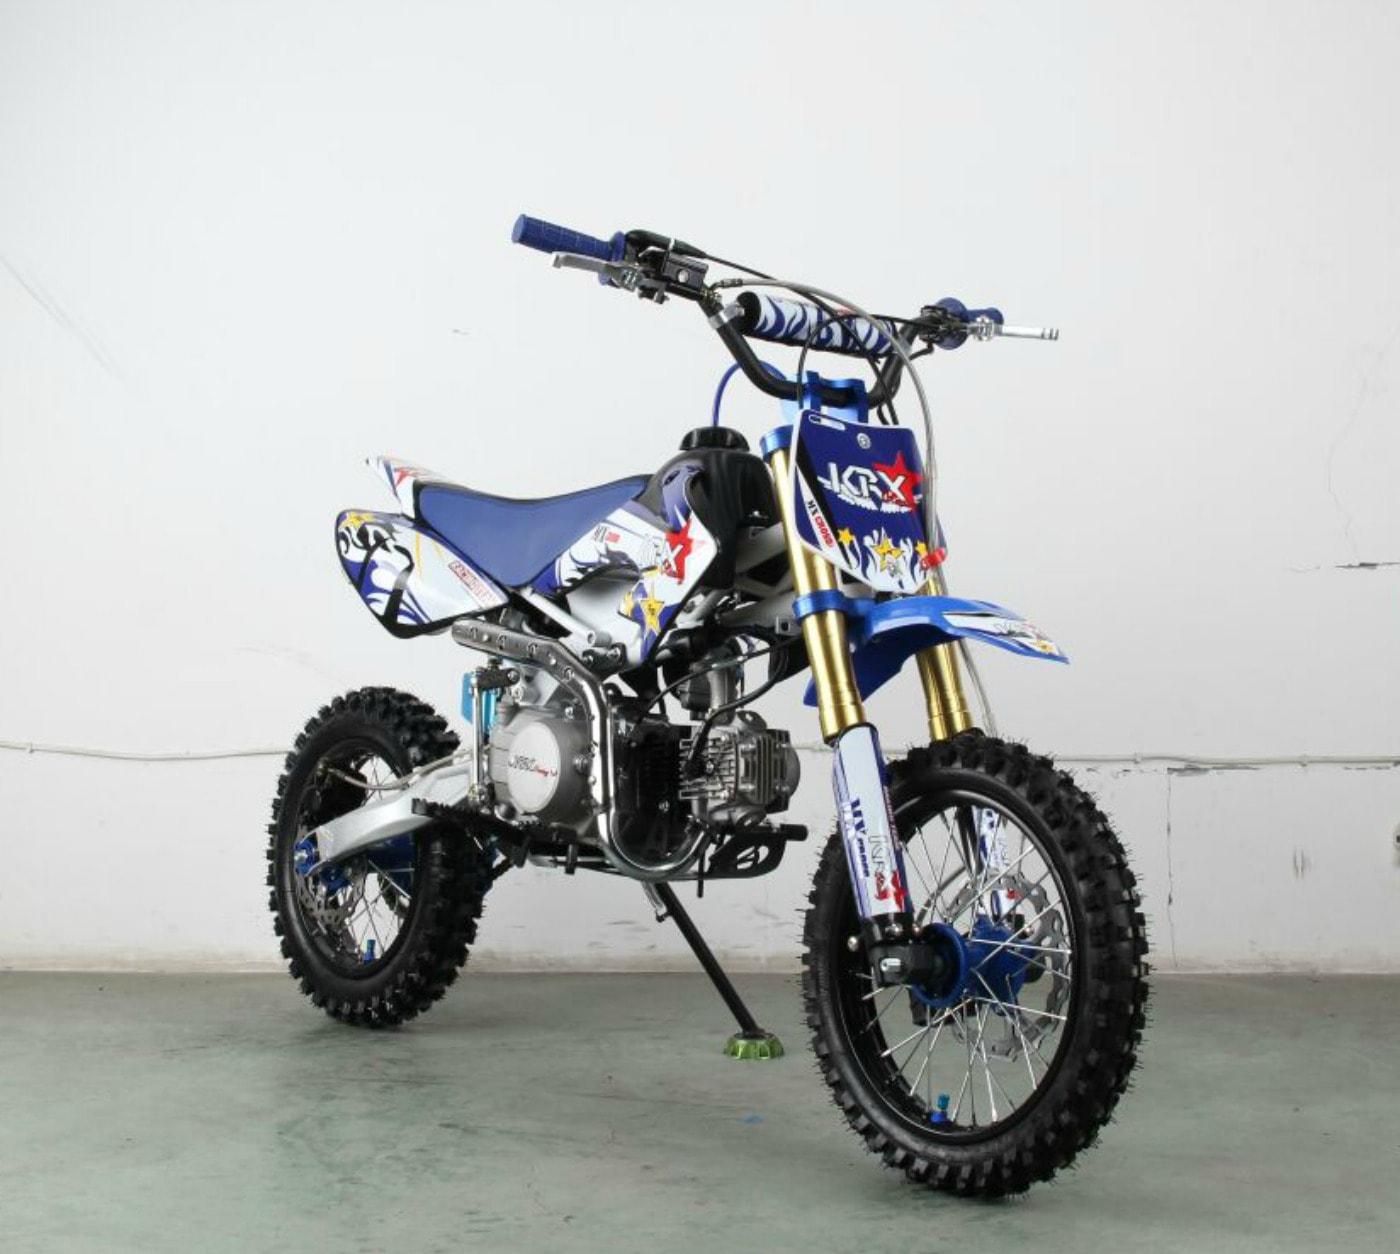 Motocross pit bike